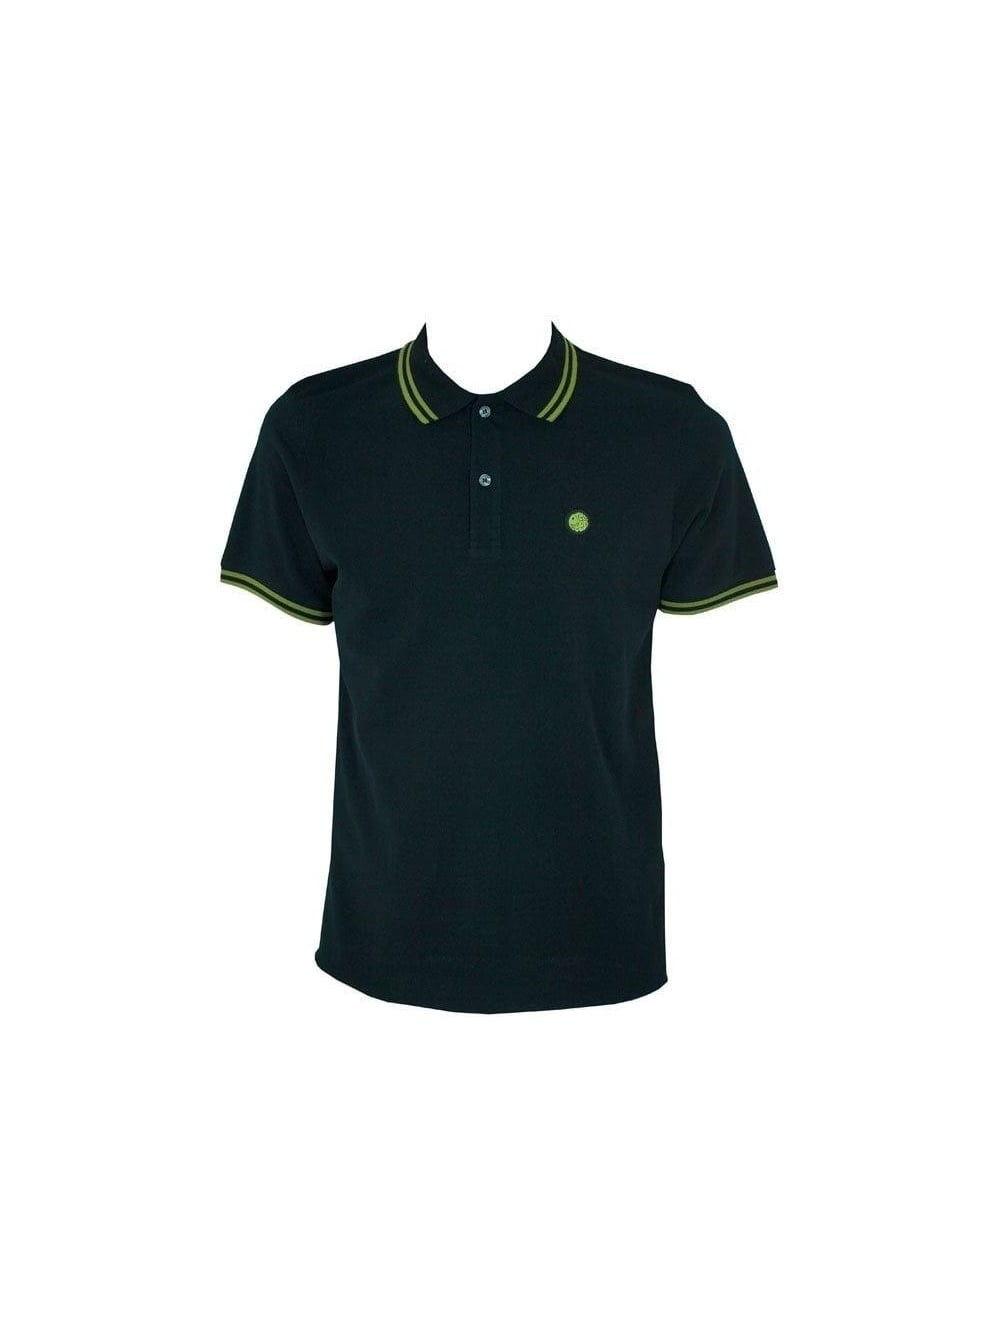 Pretty Green - Pretty Green Classic Tipped Polo Shirt - Black Lime ... 64fee16ce2a1